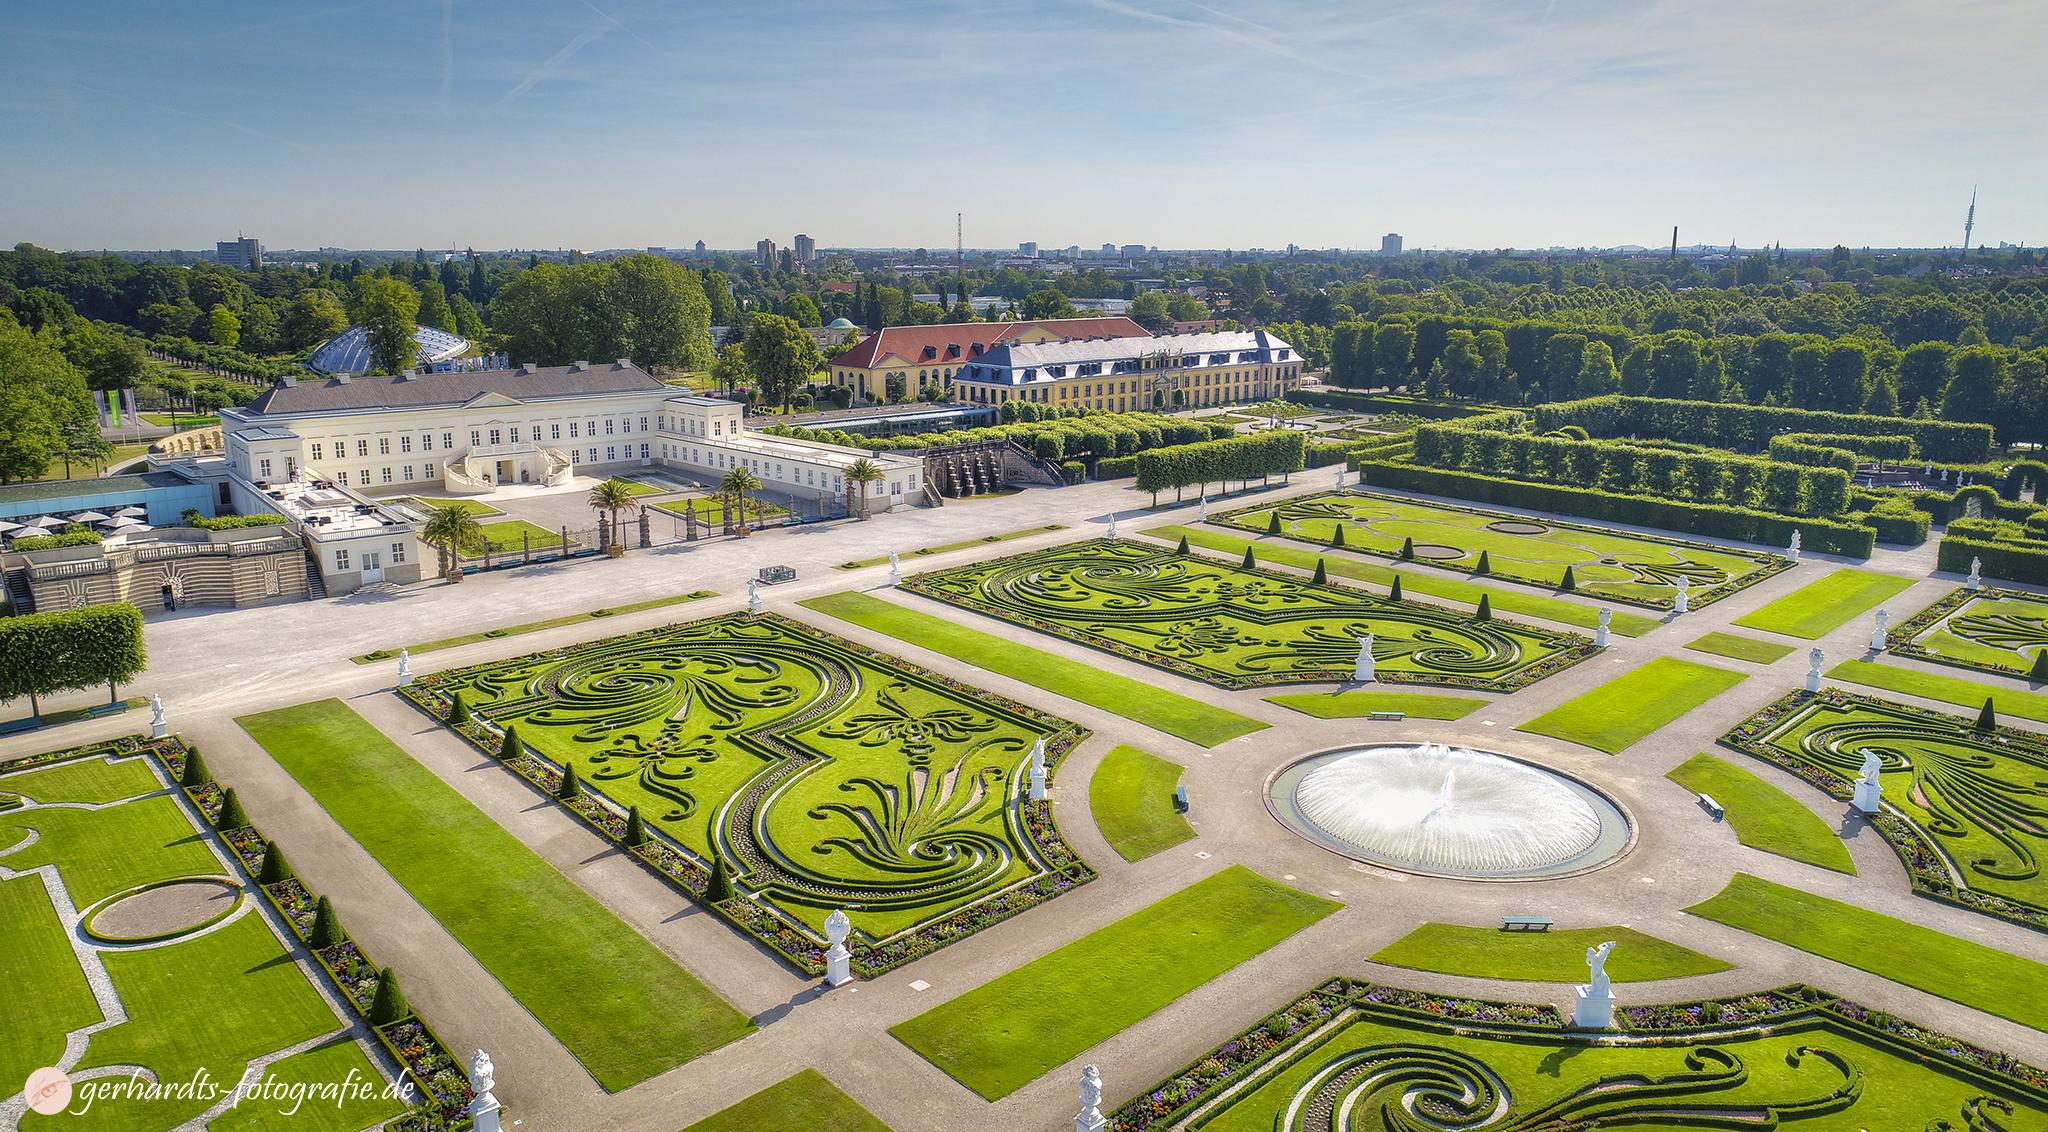 Luftbild Herrenhäuser Gärten Hannover Schloss Herrenhausen